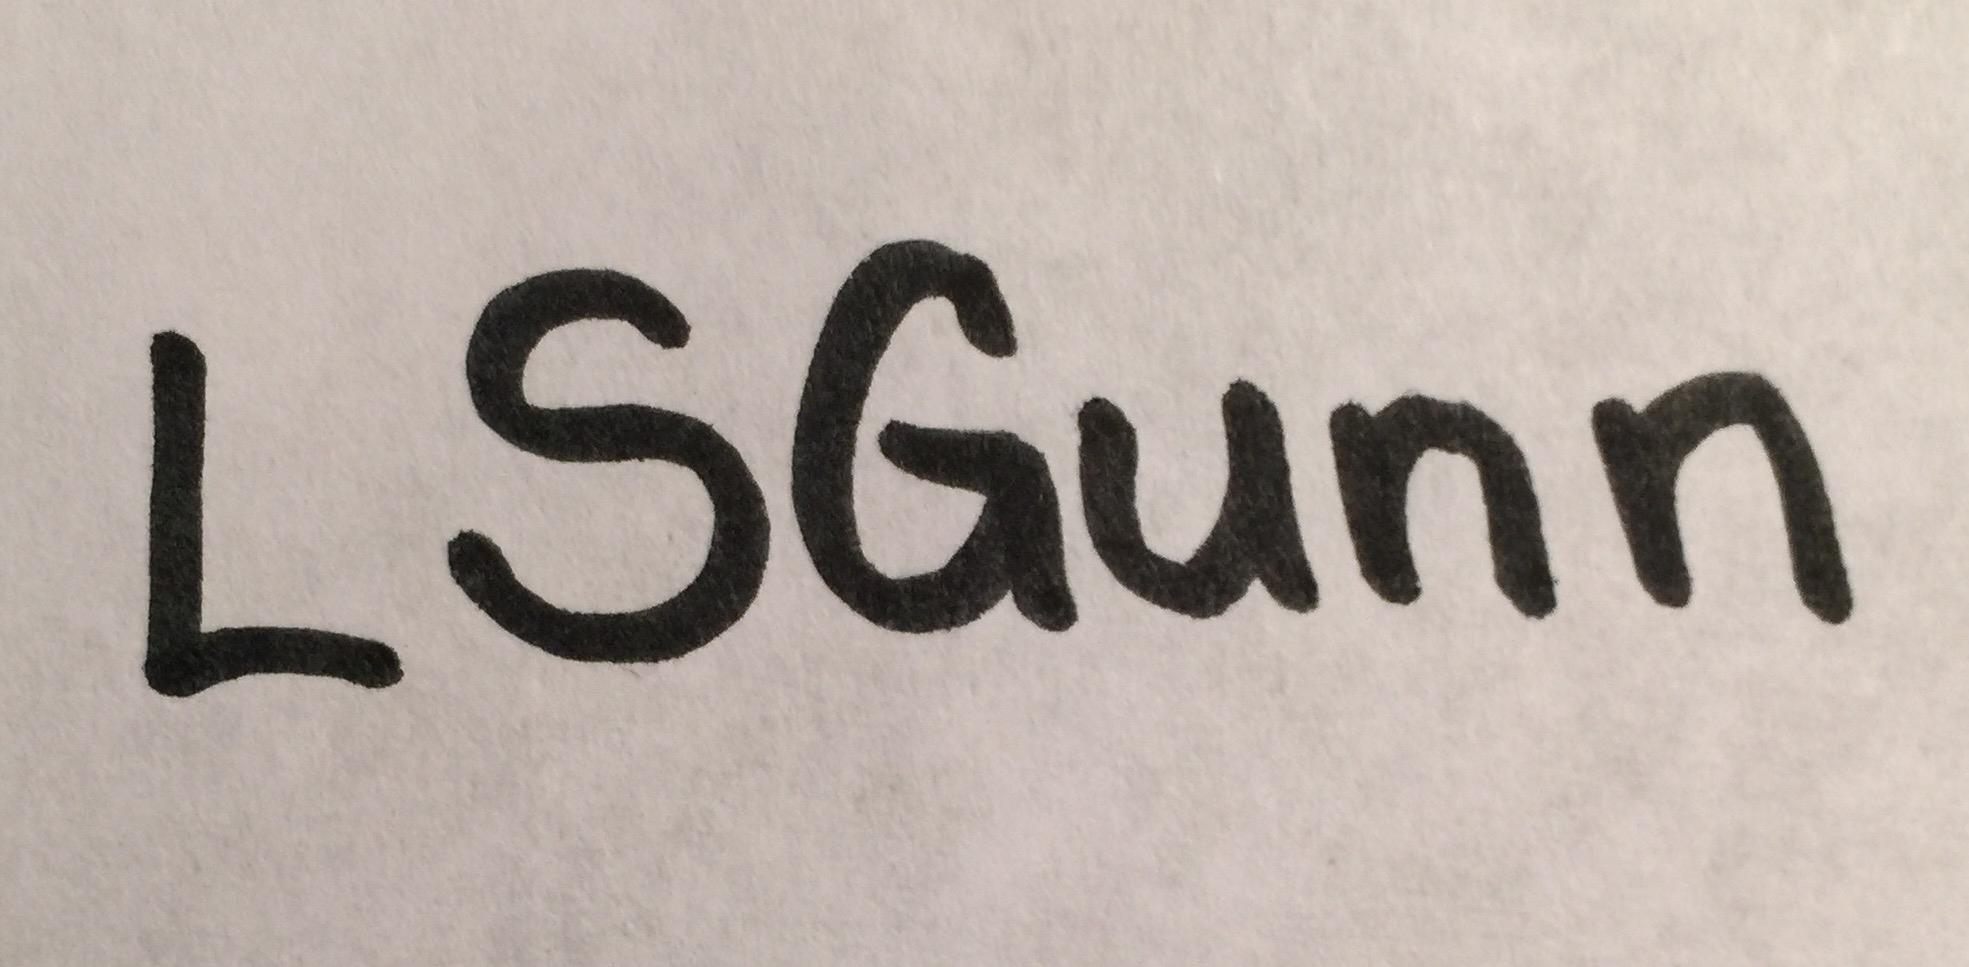 LSGunn's Signature